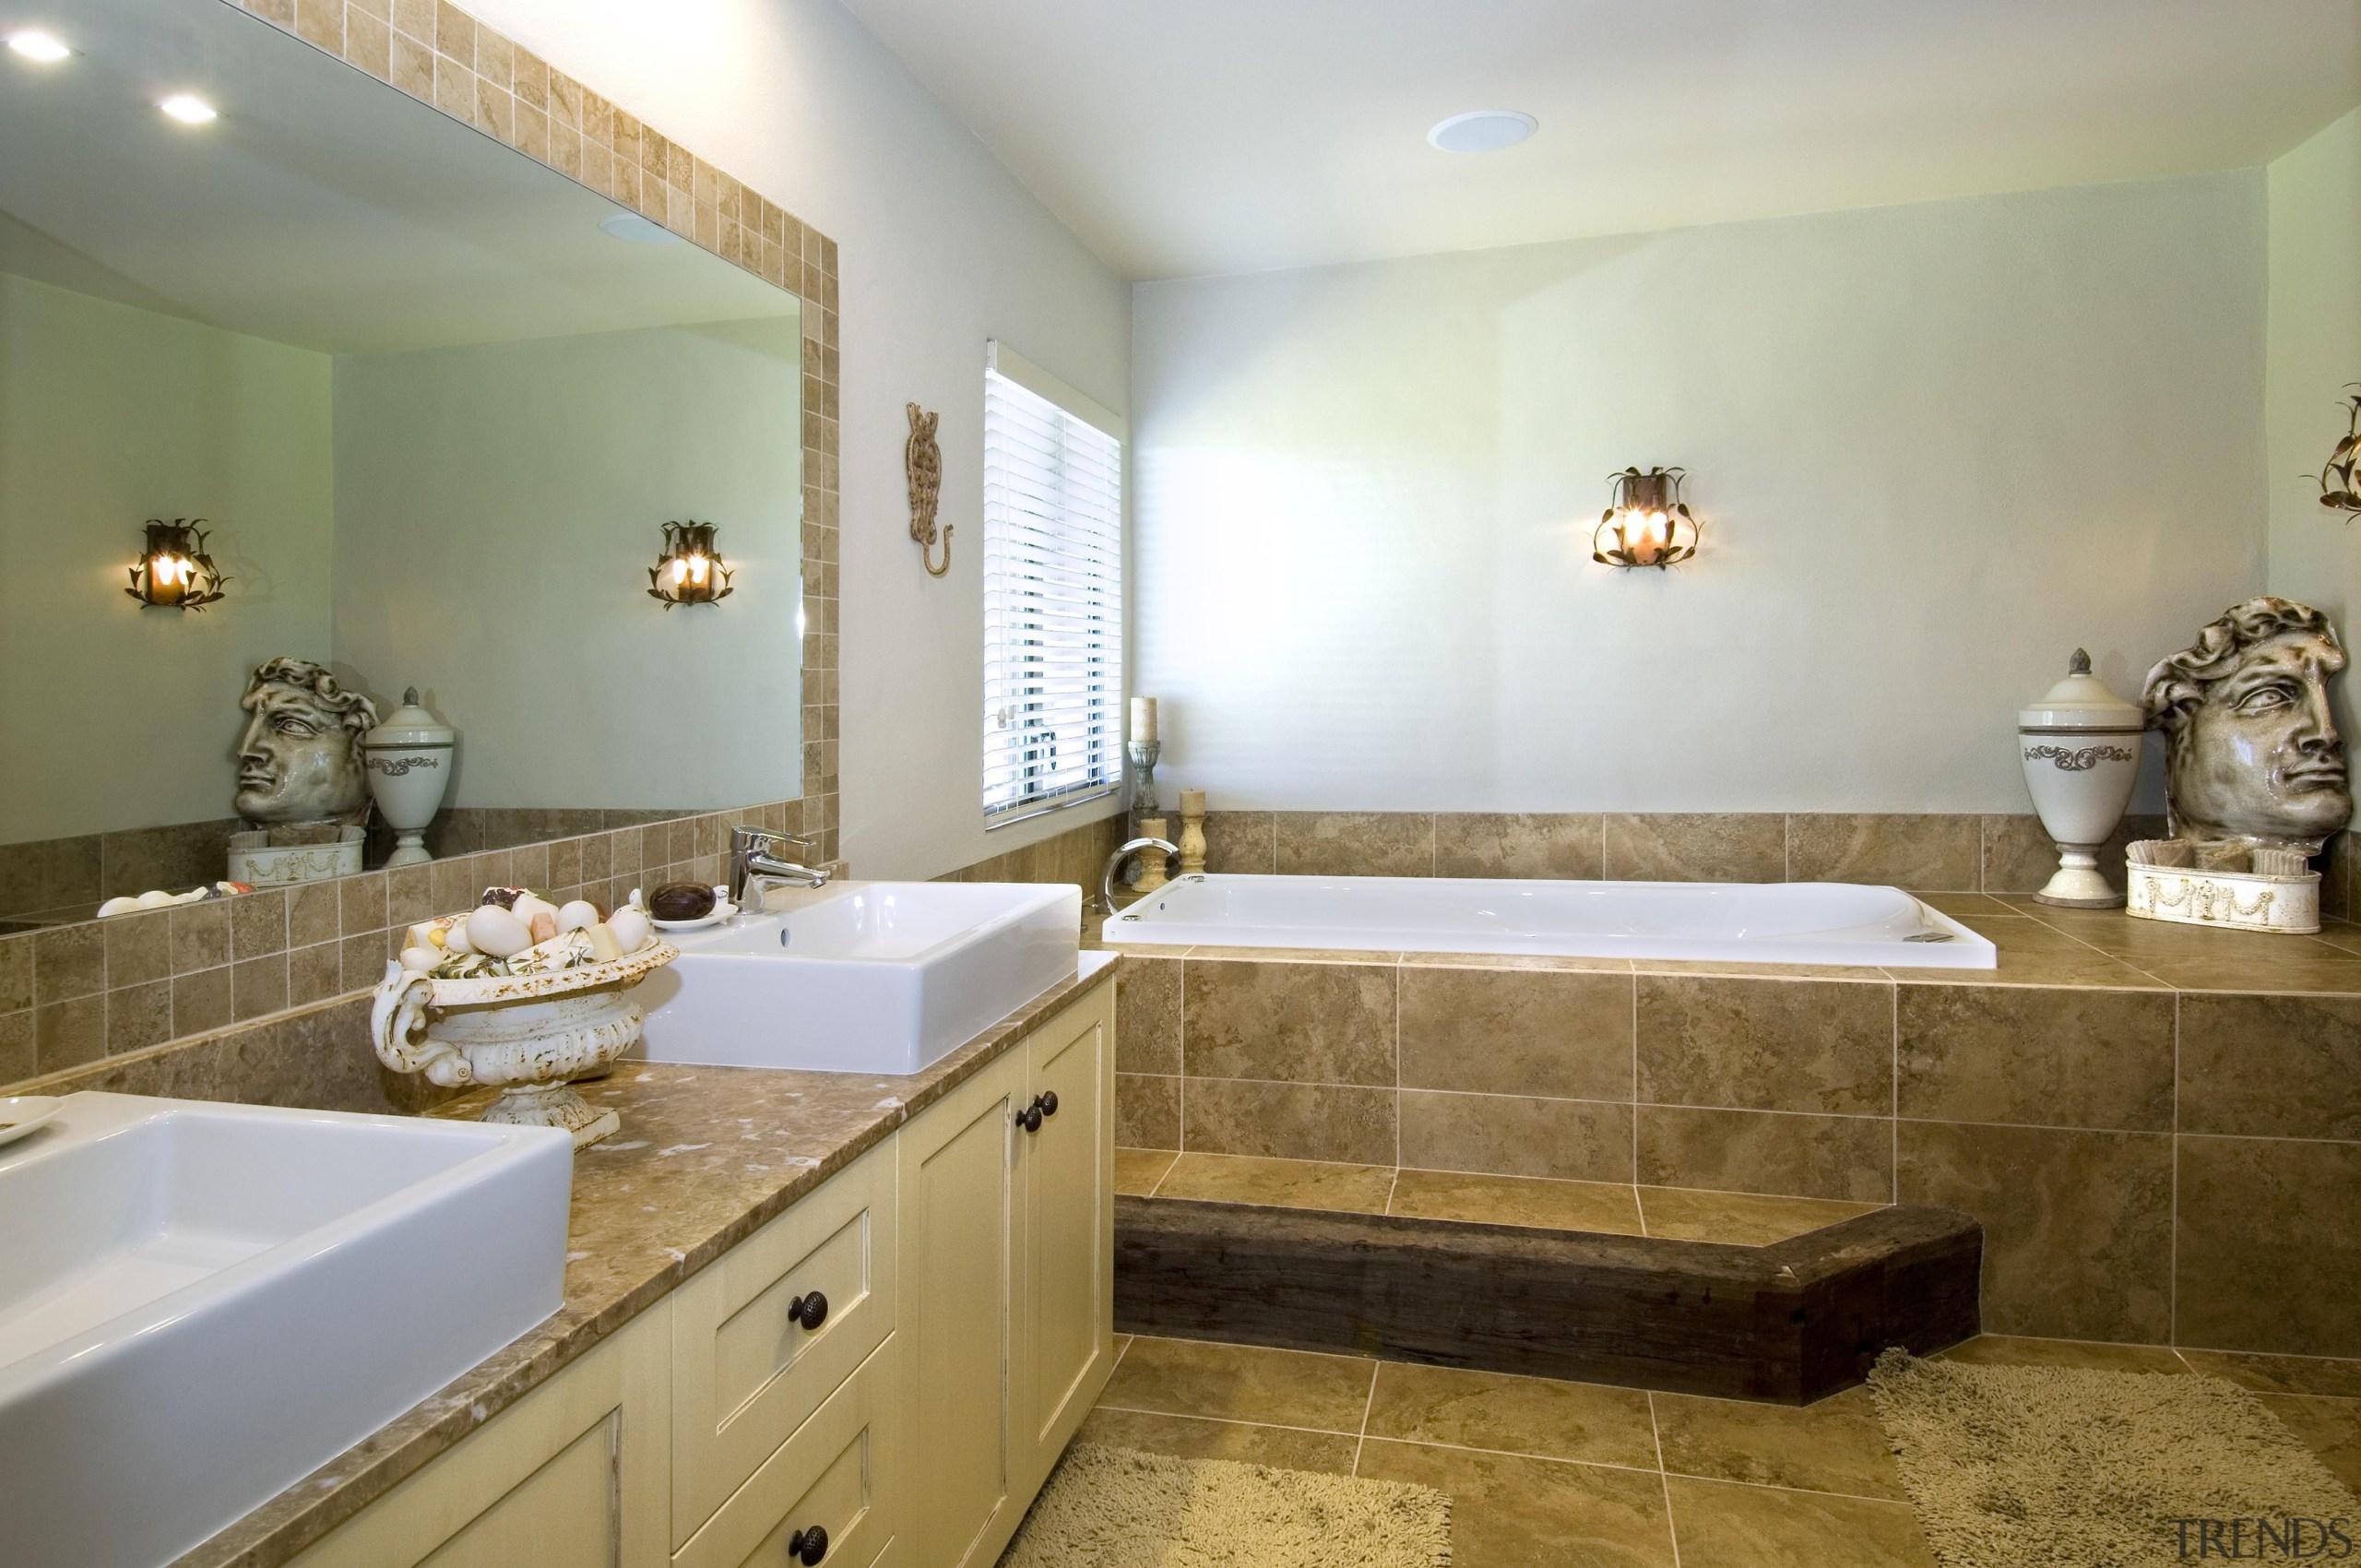 171mangawhai 14 - mangawhai_14 - bathroom | countertop bathroom, countertop, estate, floor, home, interior design, property, real estate, room, sink, tile, brown, gray